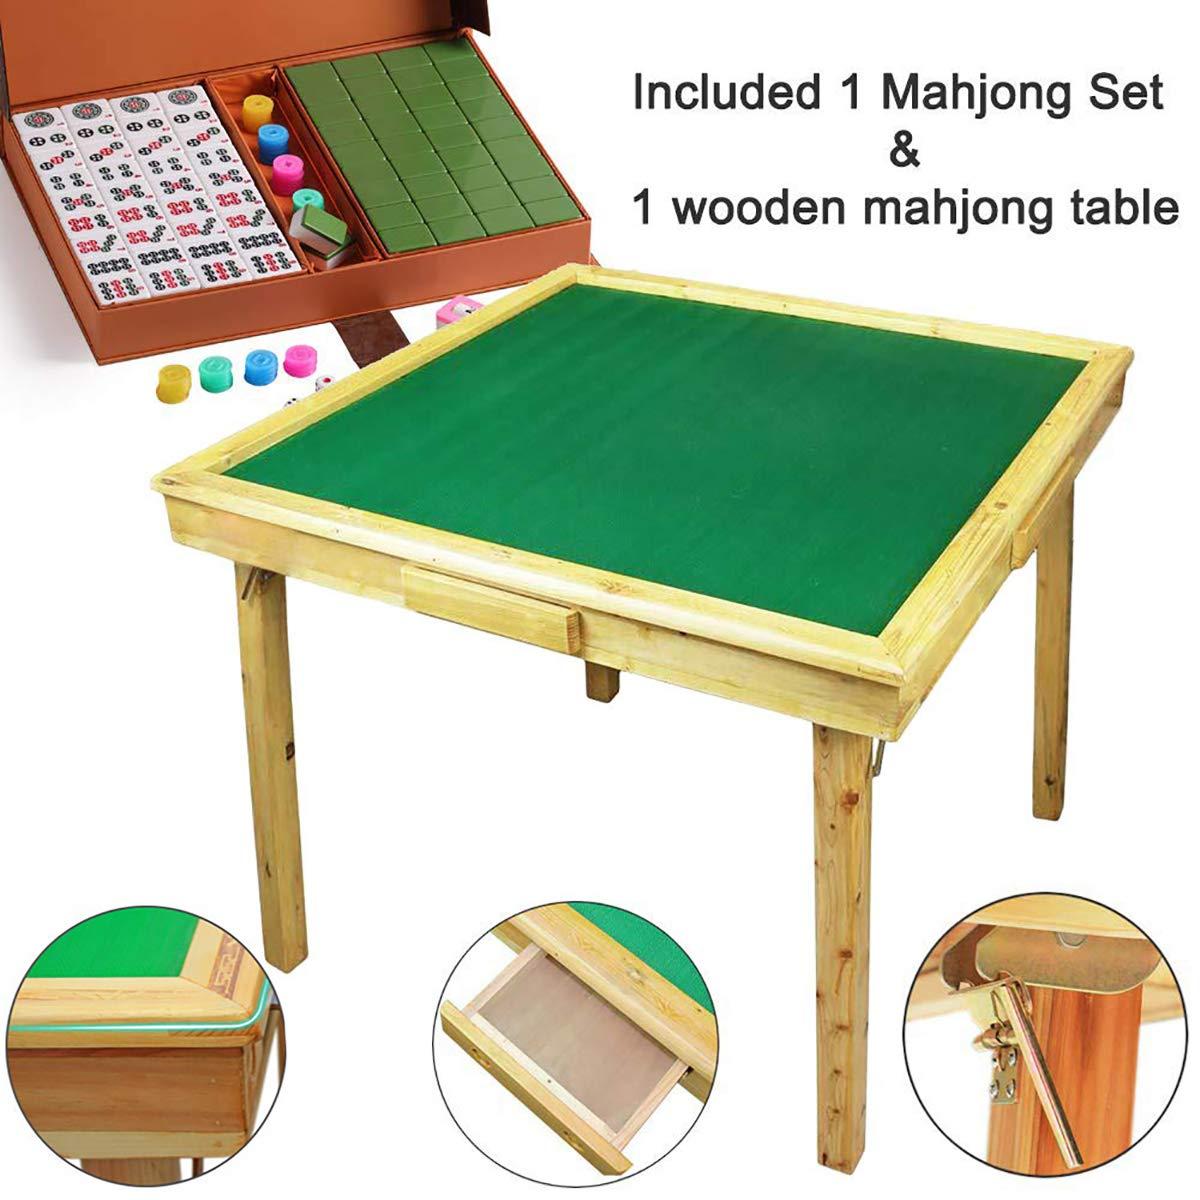 Juego de mesa Mahjong grande, de madera reversible y portátil, 88 cm + un juego completo de 144 baldosas extra grandes Mahjong para Póquer/Dominó/cartas/Paigow/mesa de juego Mahjong con soportes para monedas: Amazon.es: